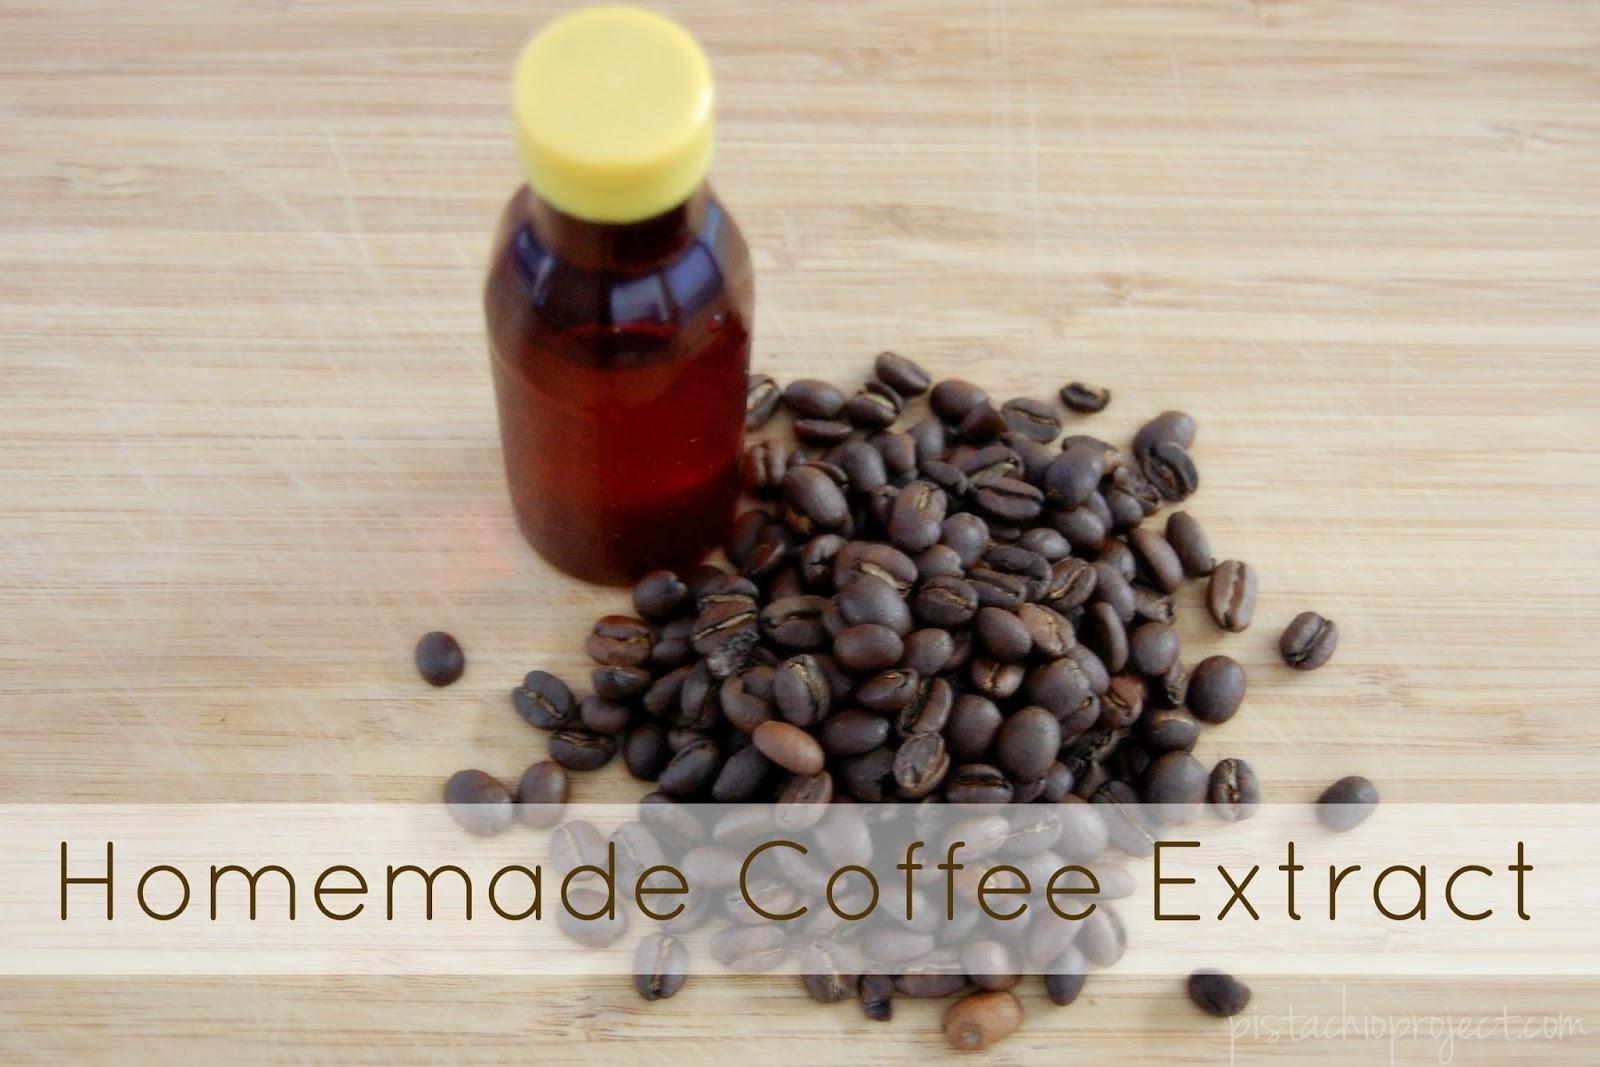 Homemade Coffee Extract